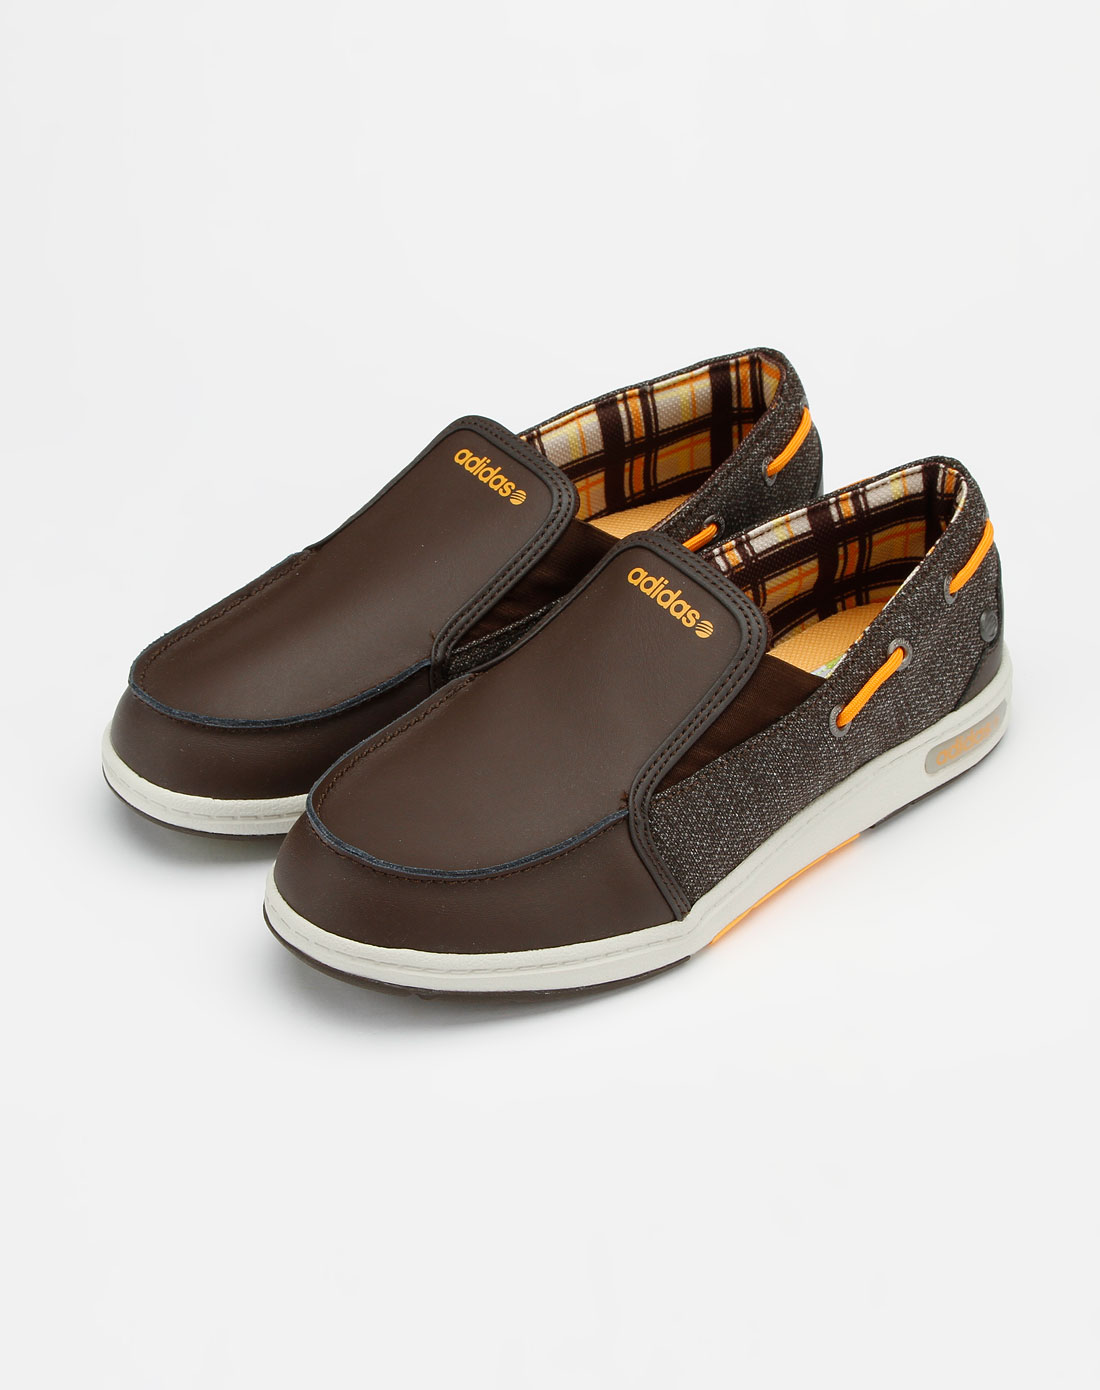 neo棕色时尚潮流休闲鞋